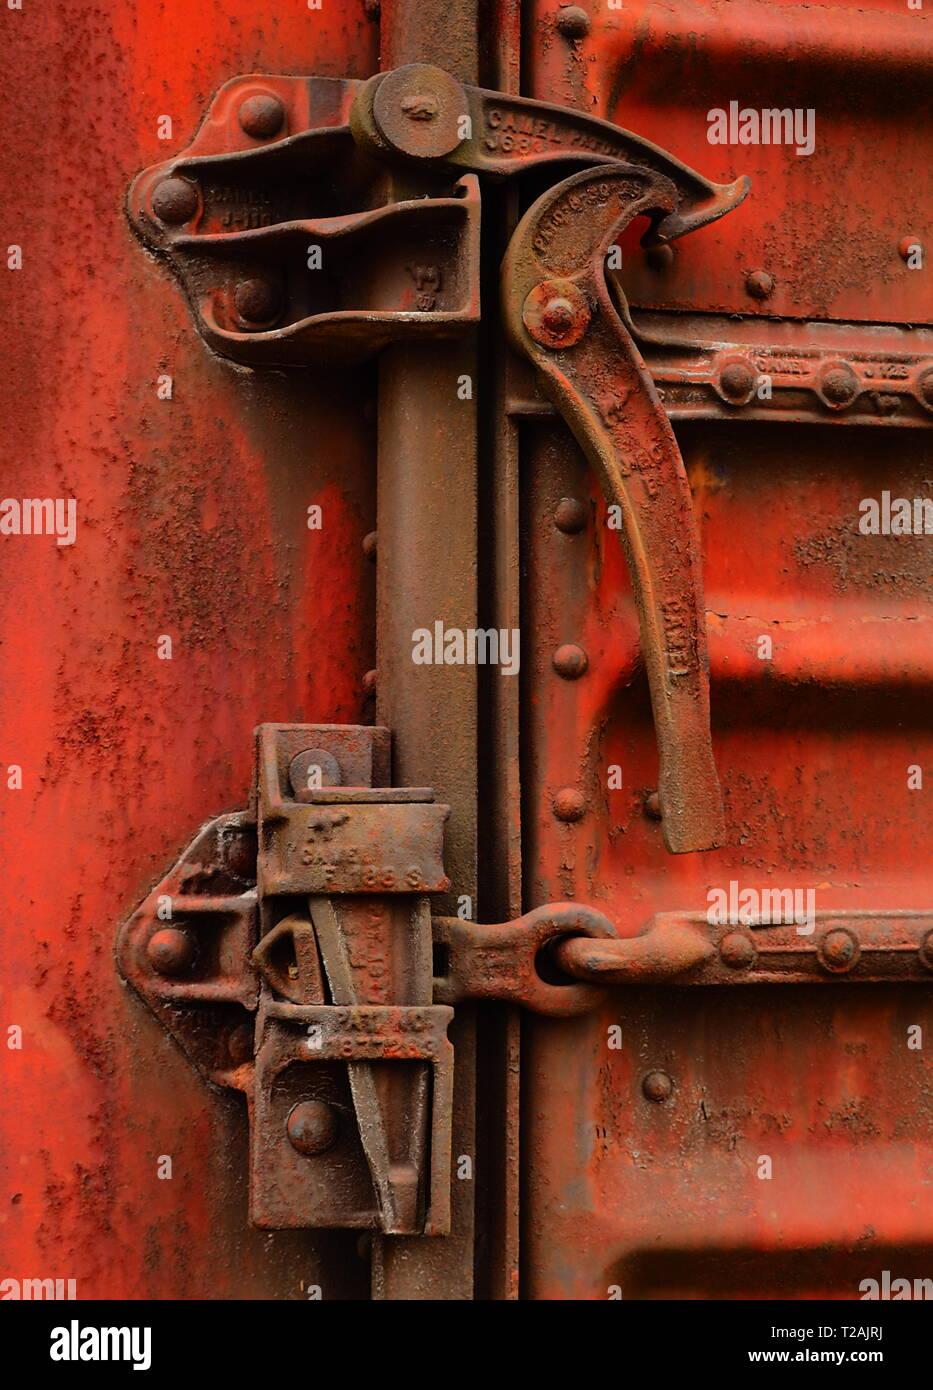 Lock on abandoned railroad hopper car, vintage  train detail - Stock Image